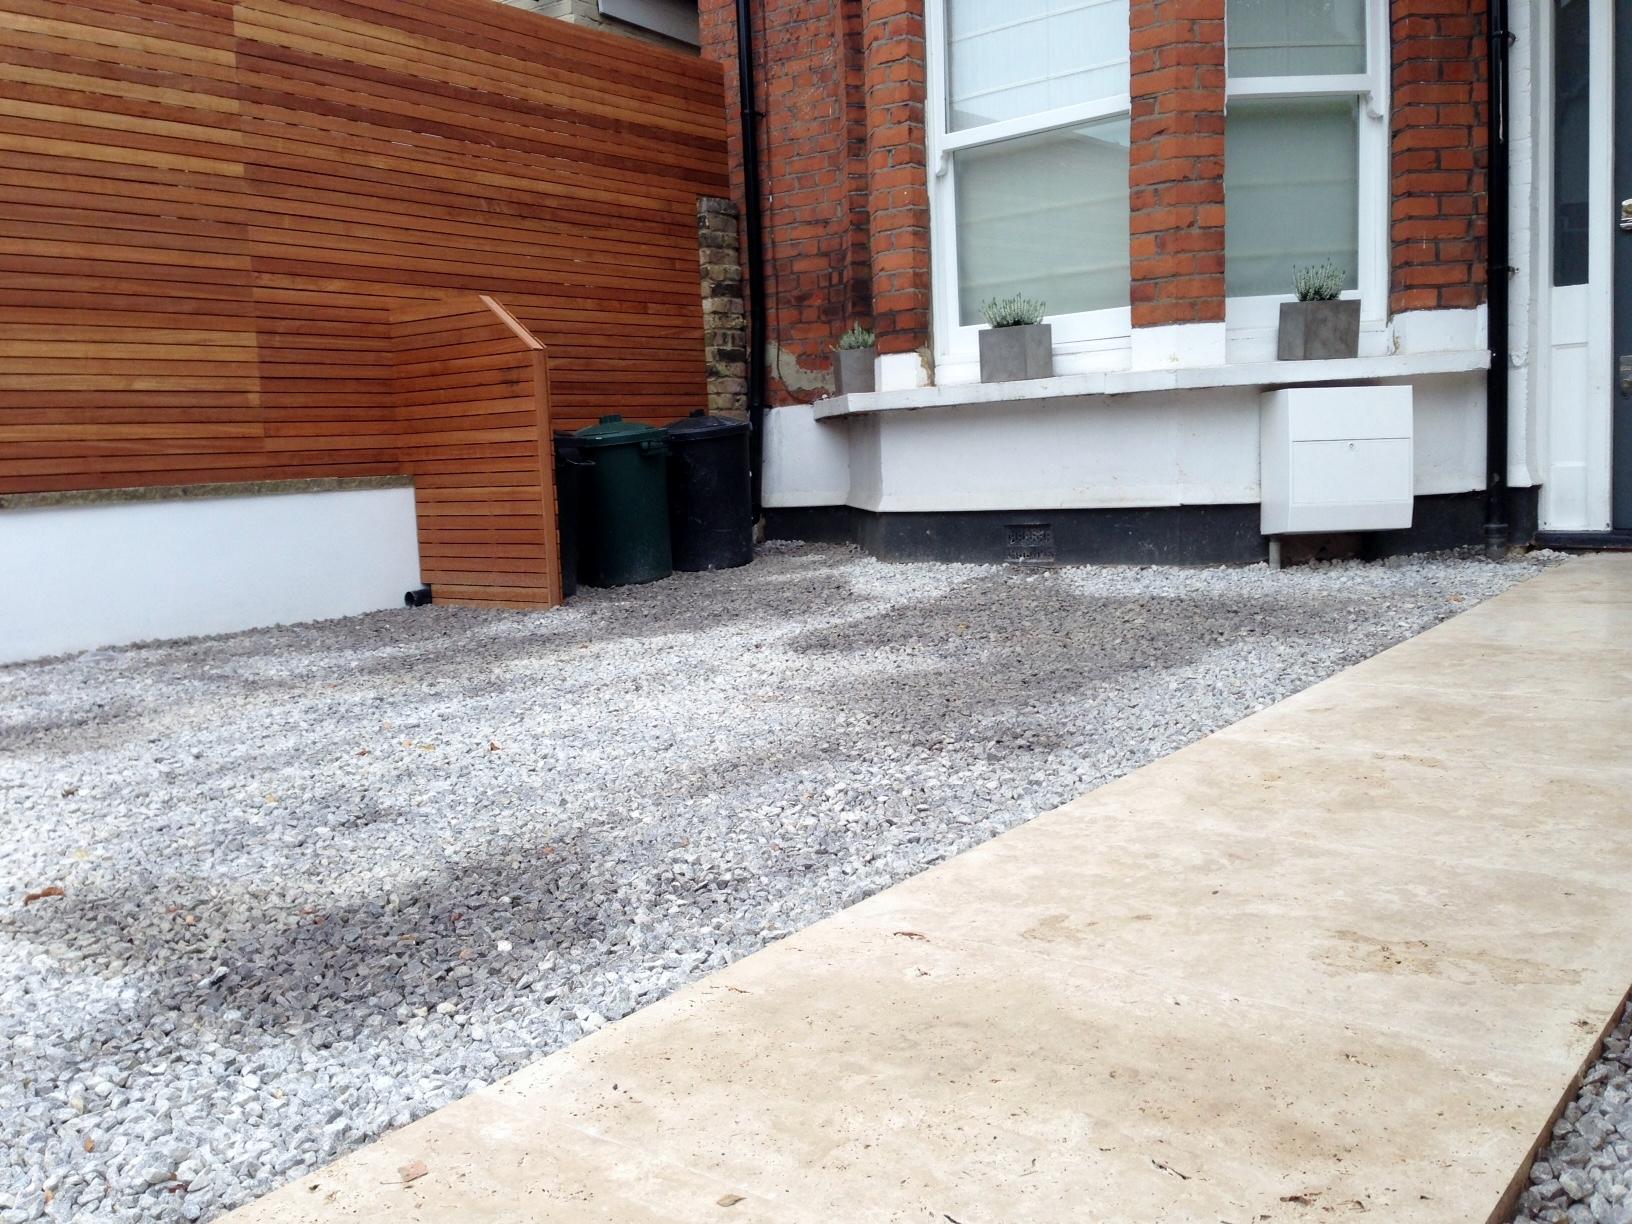 front garden drivewat gravel travertine paving path hardwood privacy screen trellis tooting london (7)